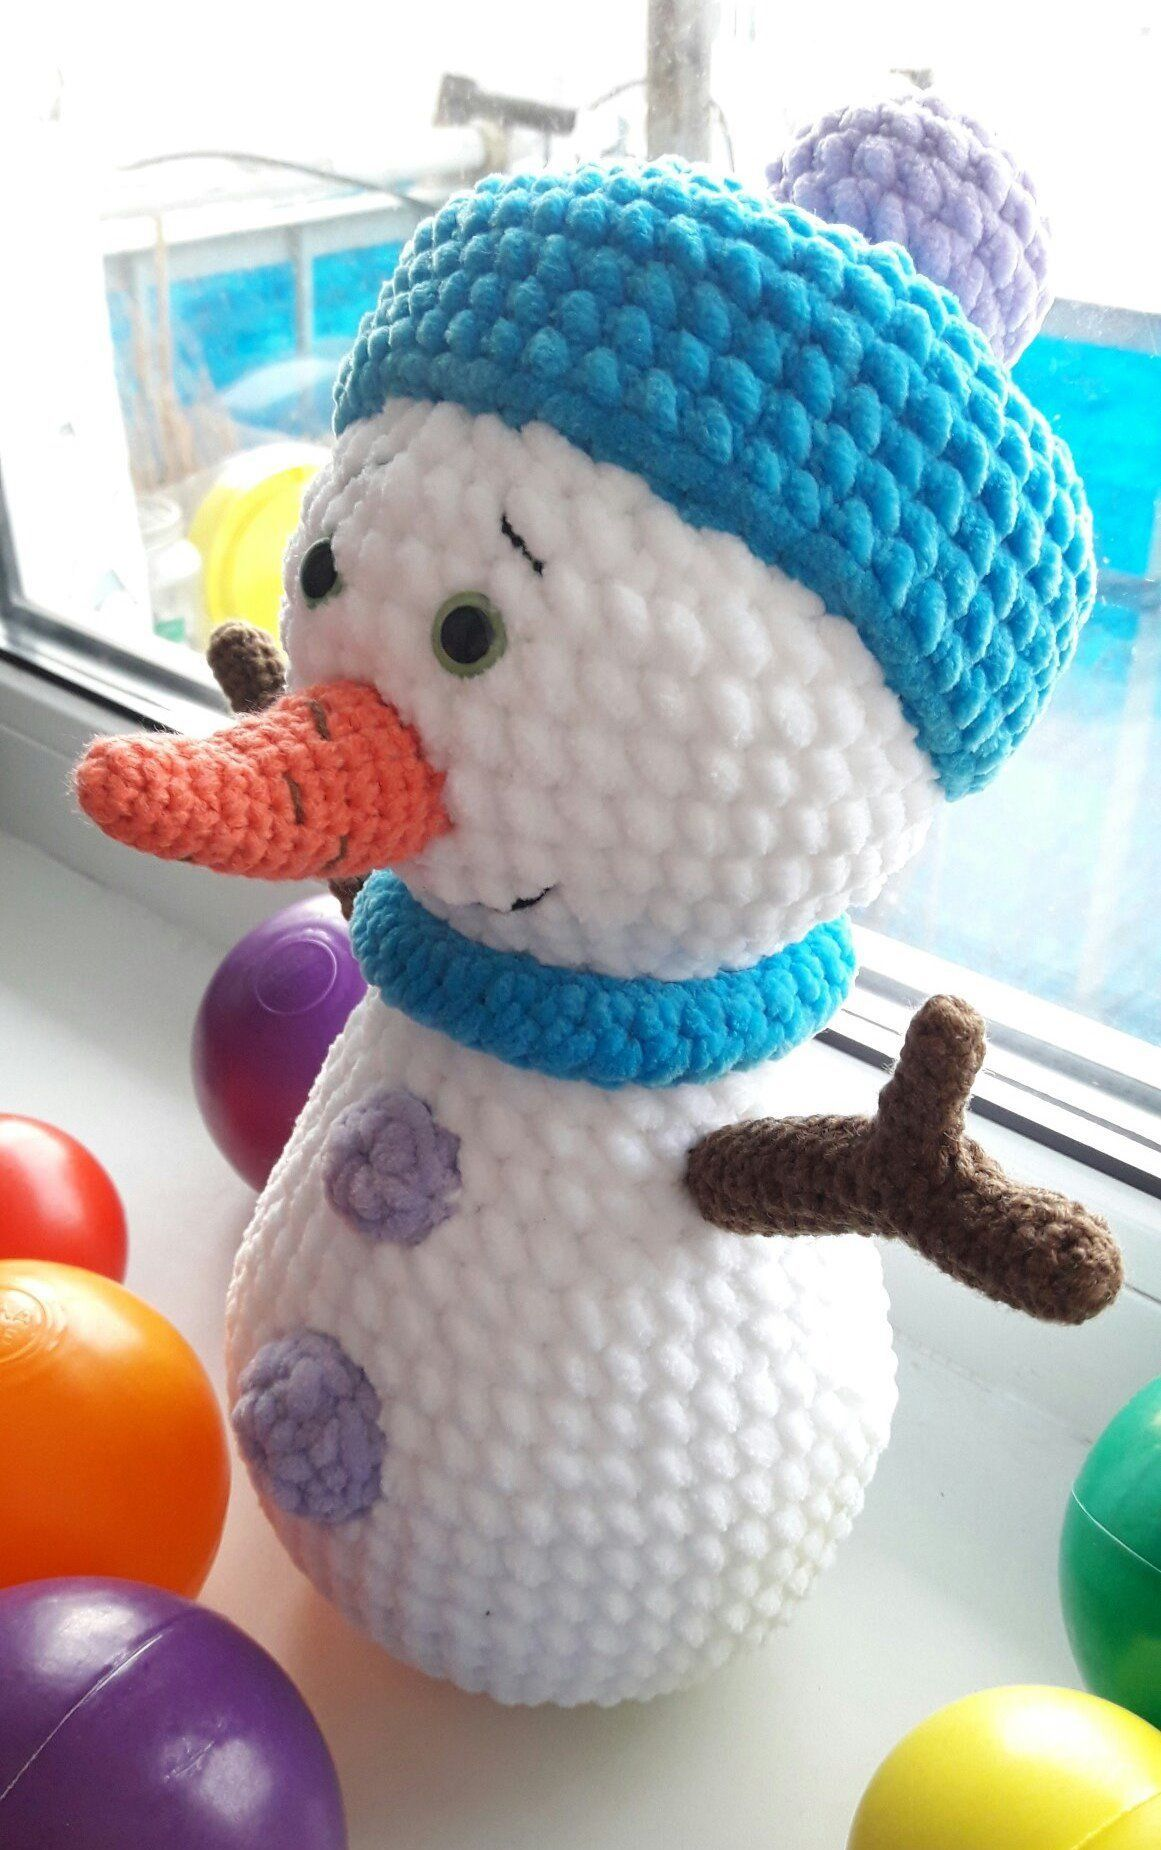 Snowman Amigurumi - Free Crochet Pattern - StringyDingDing | 1850x1161